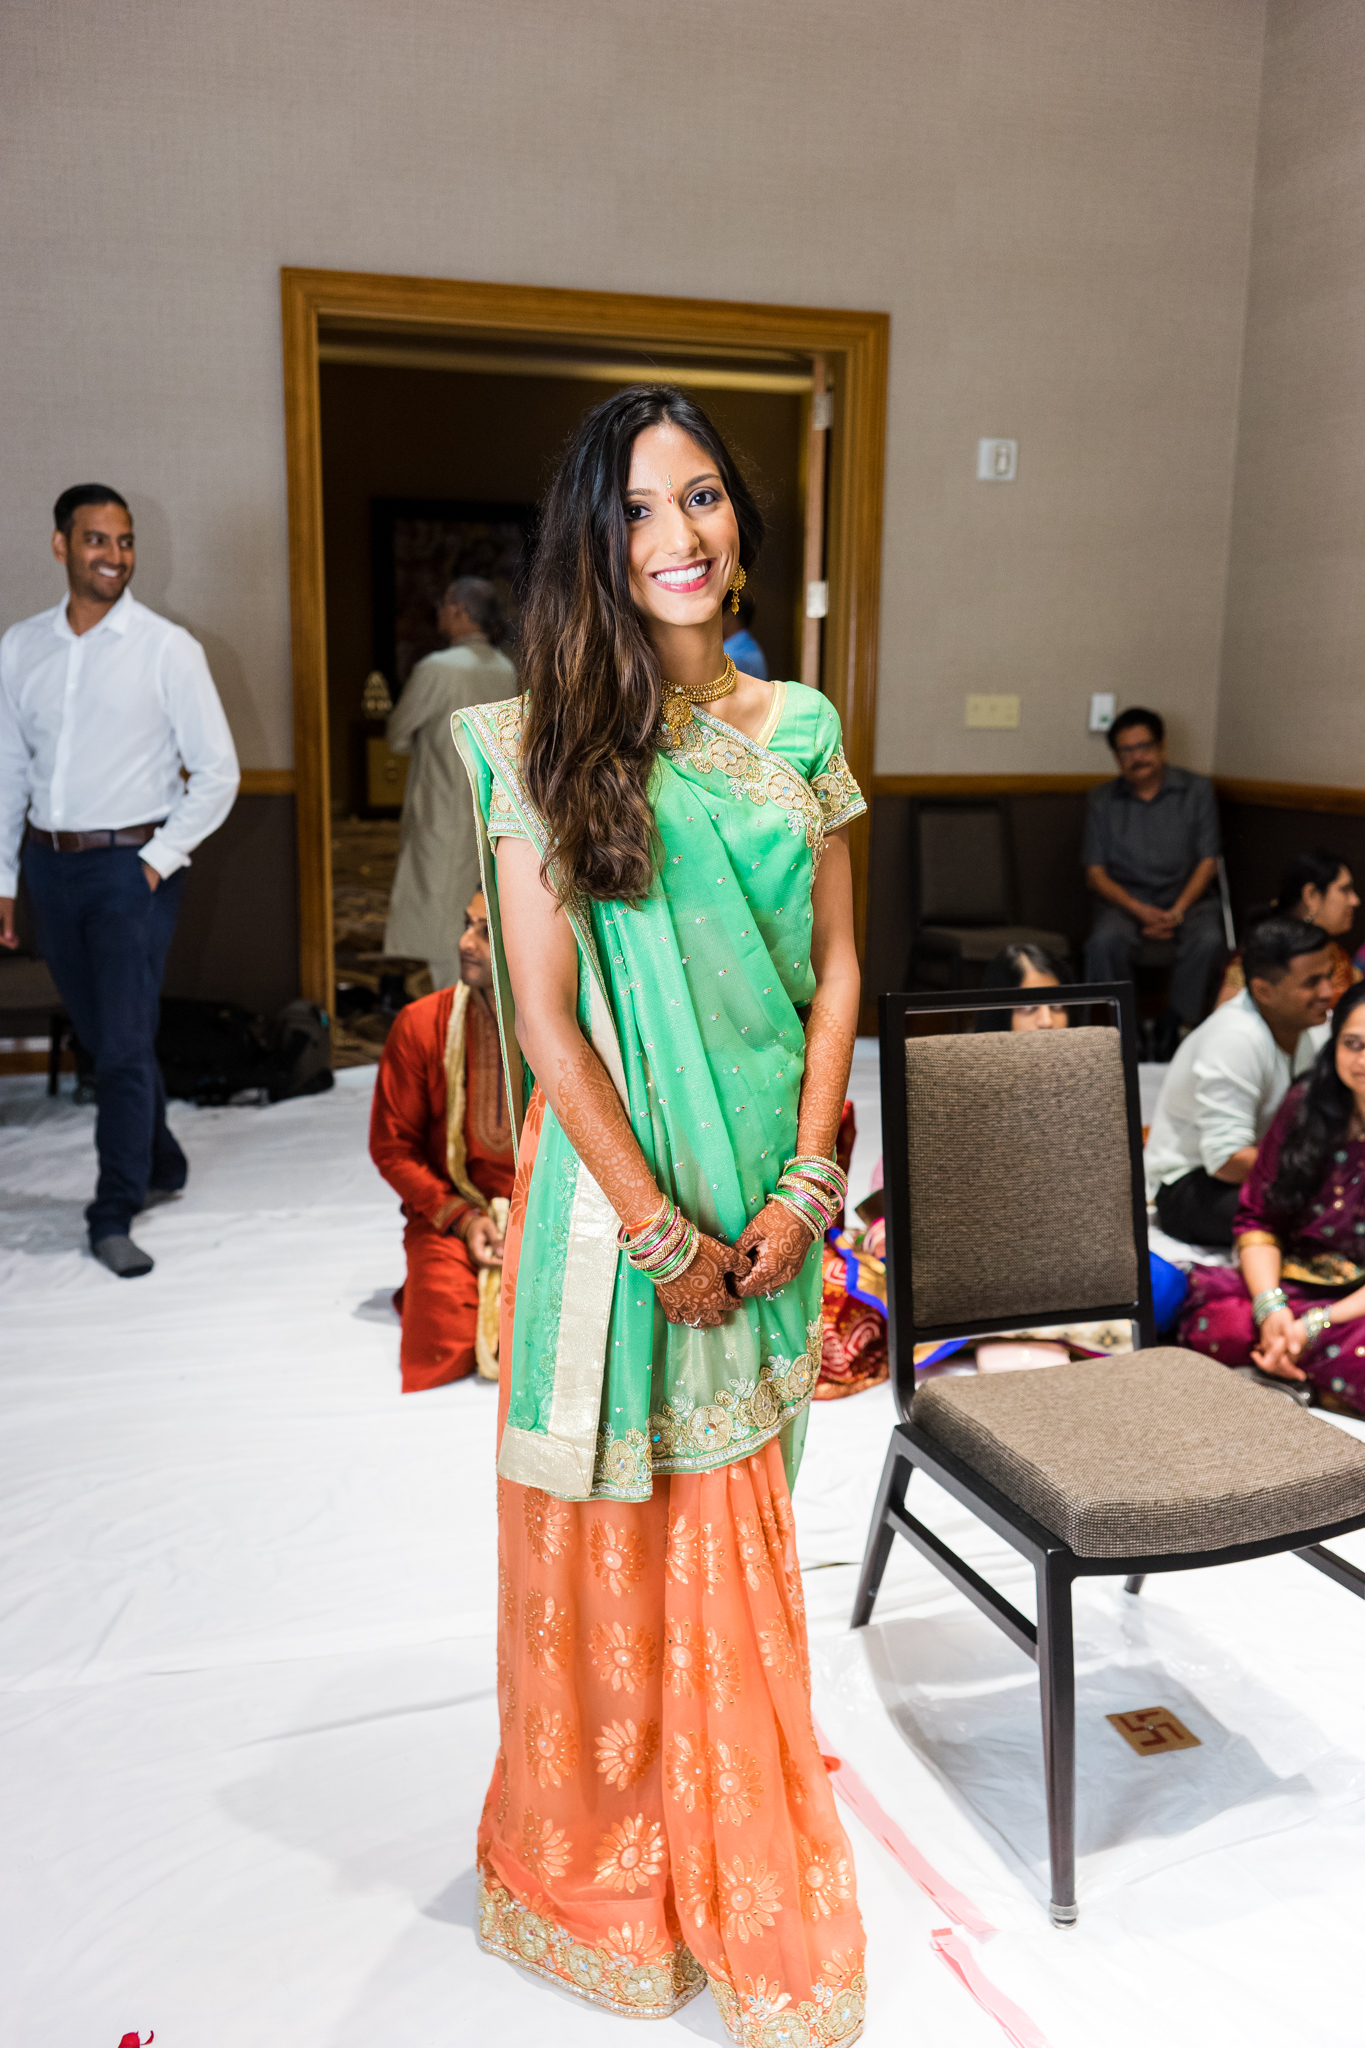 ReeyaAman-Wedding-Photography-www.MnMfoto.comMnMfoto-Krishna-Sajan-146.jpg